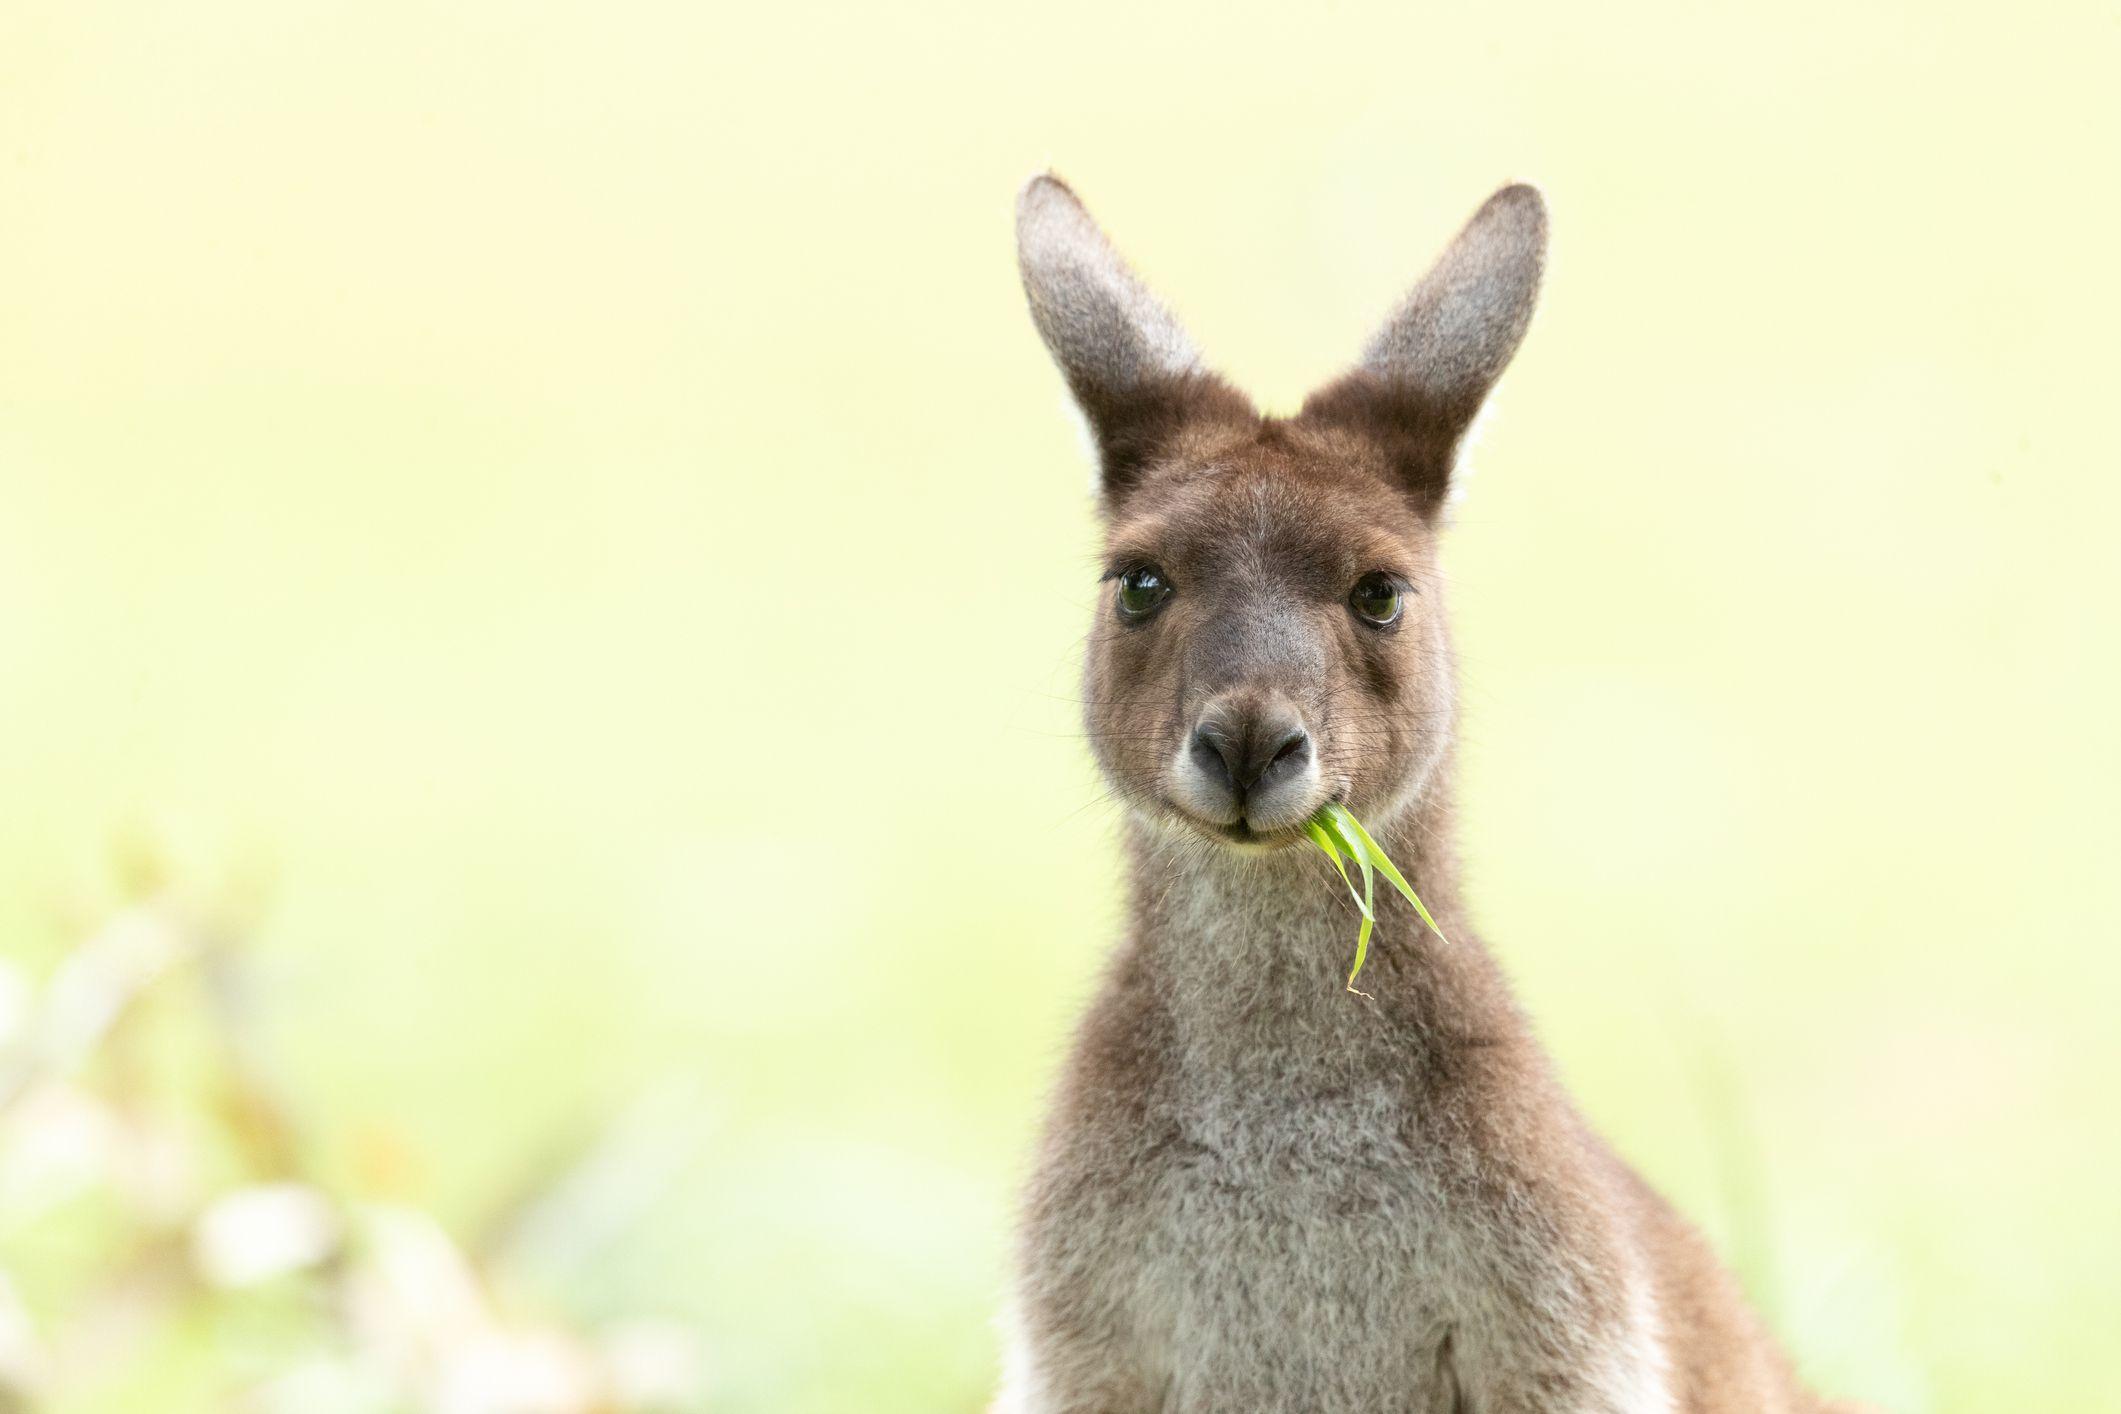 A western gray kangaroo chews on grass.